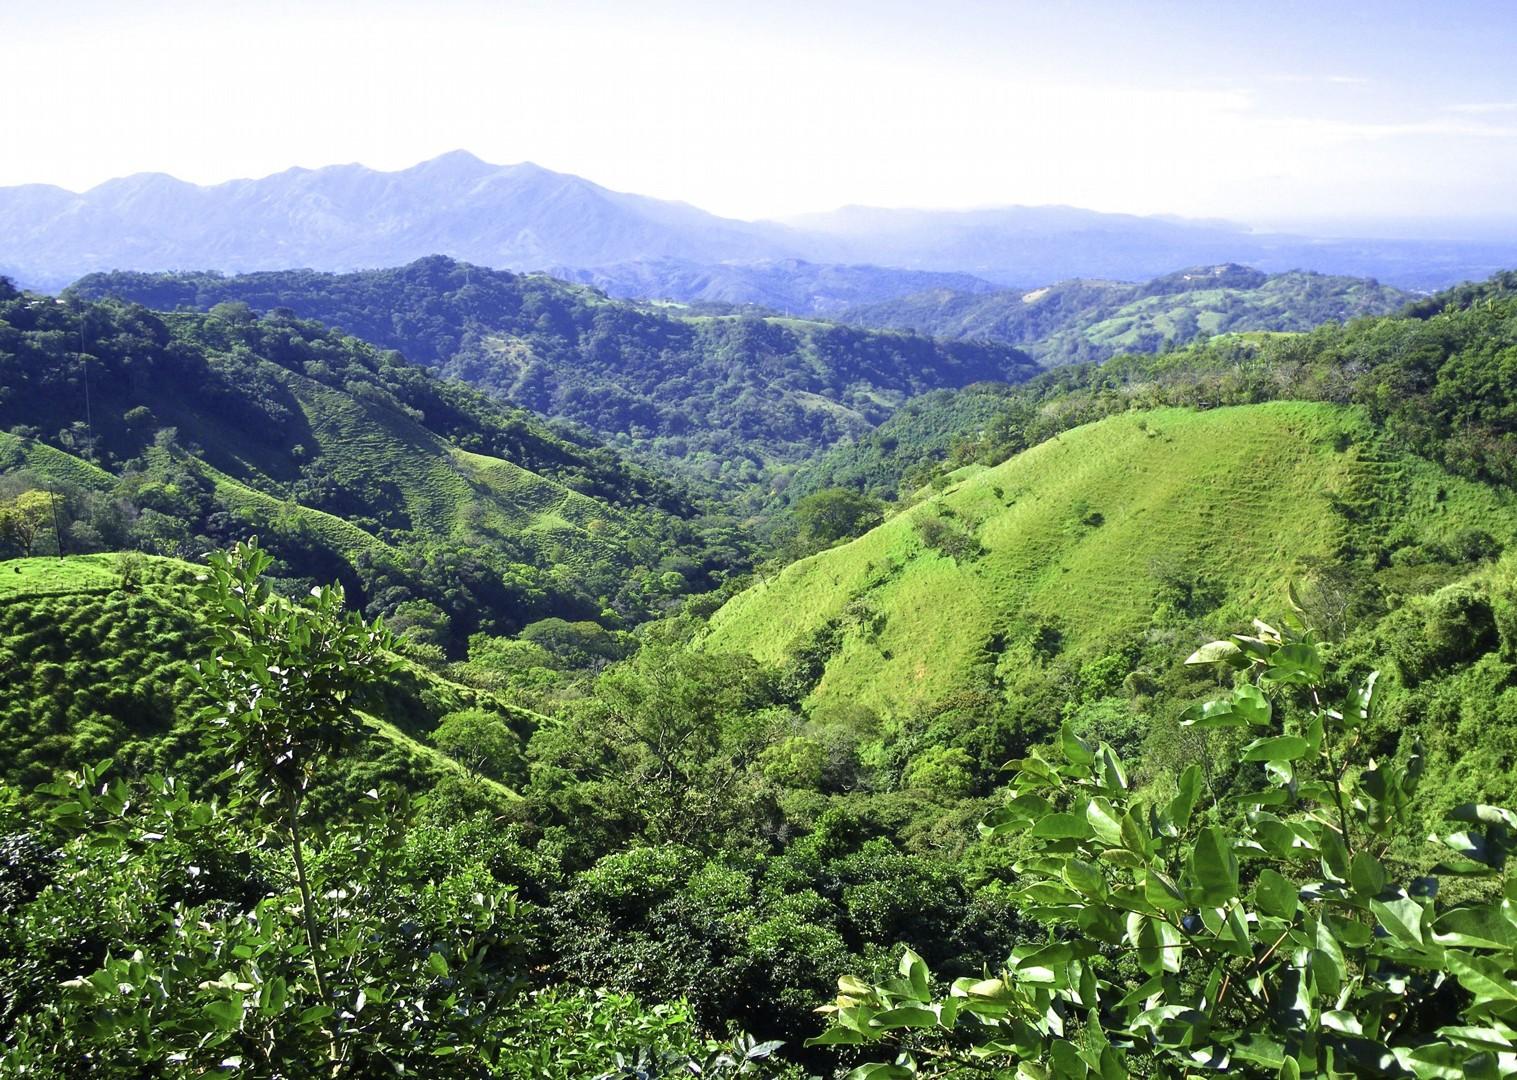 costa-rica-valleys-family-cycling-holiday.jpg - Costa Rica - Volcanoes and Valleys - Guided Family Cycling Holiday - Family Cycling